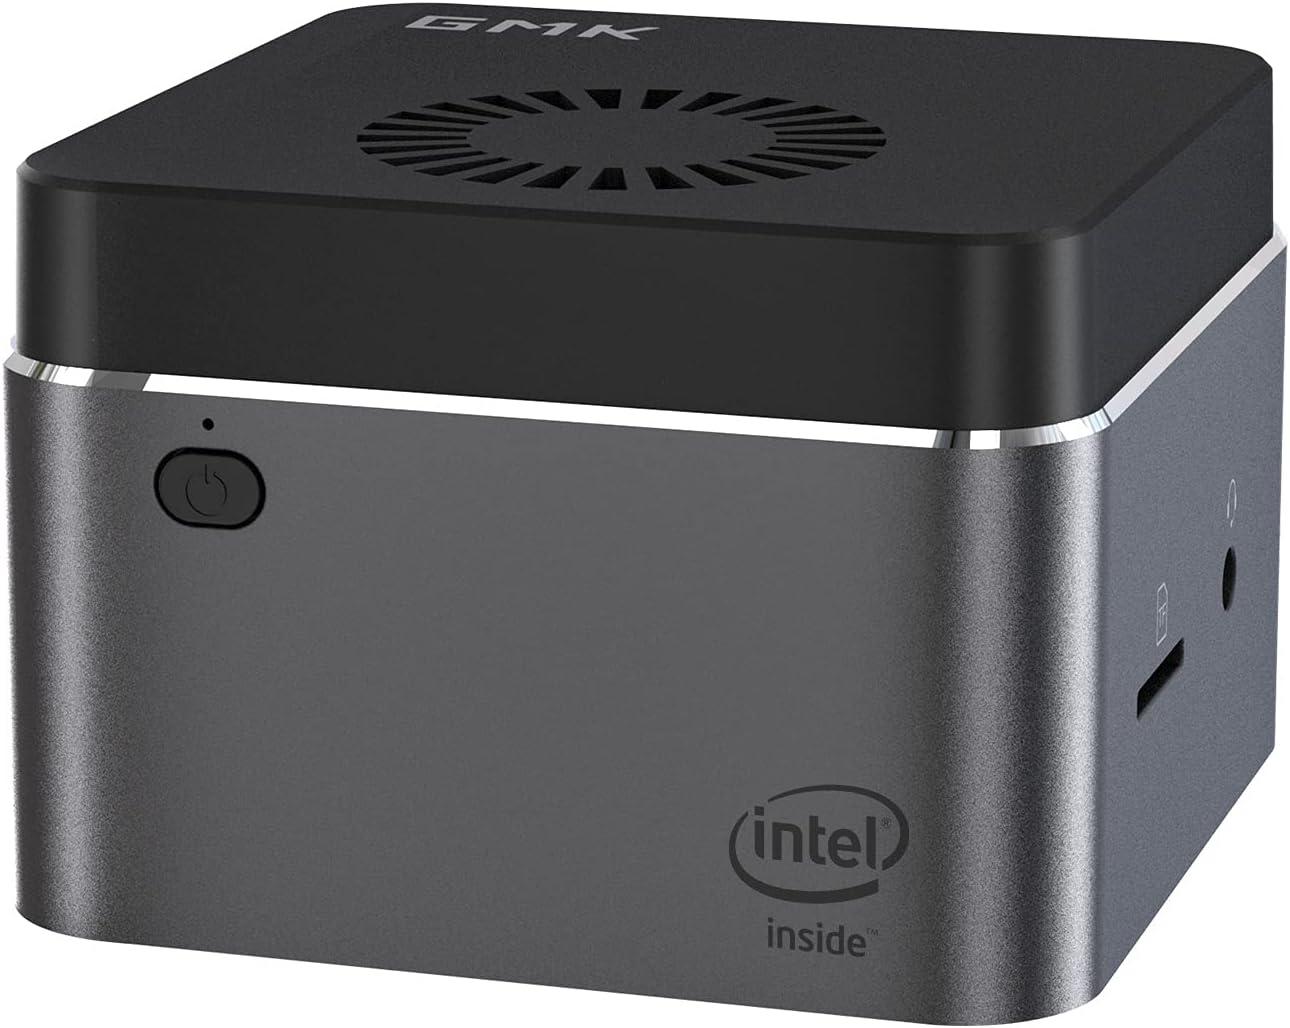 GMK Mini PC, NucBox Windows 10 Mini Computer with Intel J4125, Micro PC 8GB DDR4 RAM 512GB SSD for 4K HD by HDMI Port, Dual Band Wi-Fi and Bluetooth 4.2